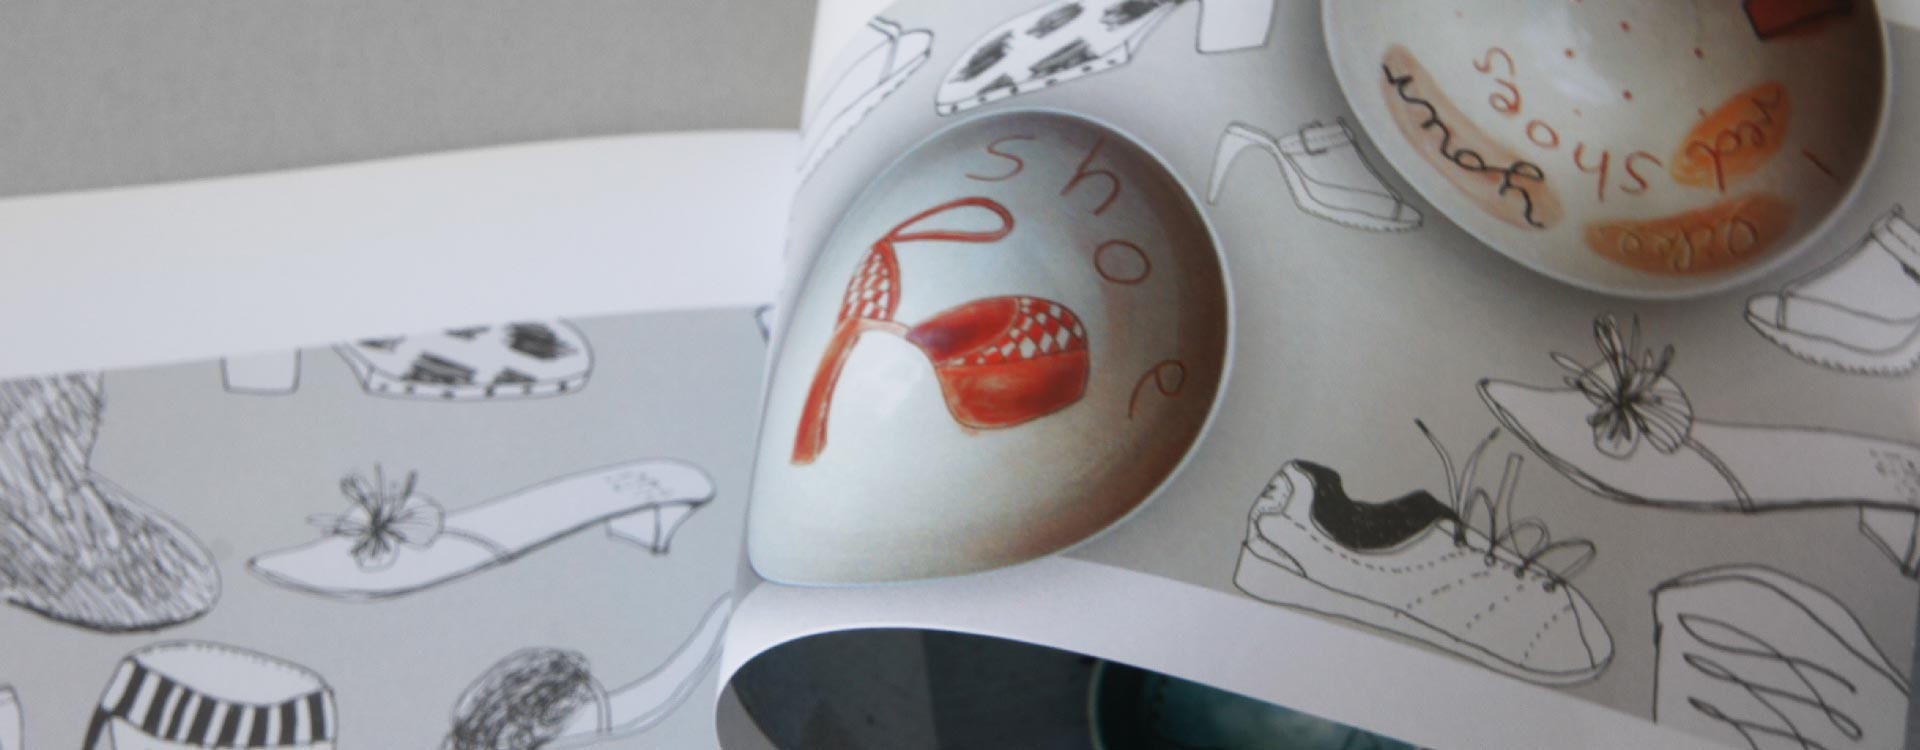 Catalogue Stefanie Neumann, Ceramics and Graphics; Design: Kattrin Richter | Graphic Design Studio